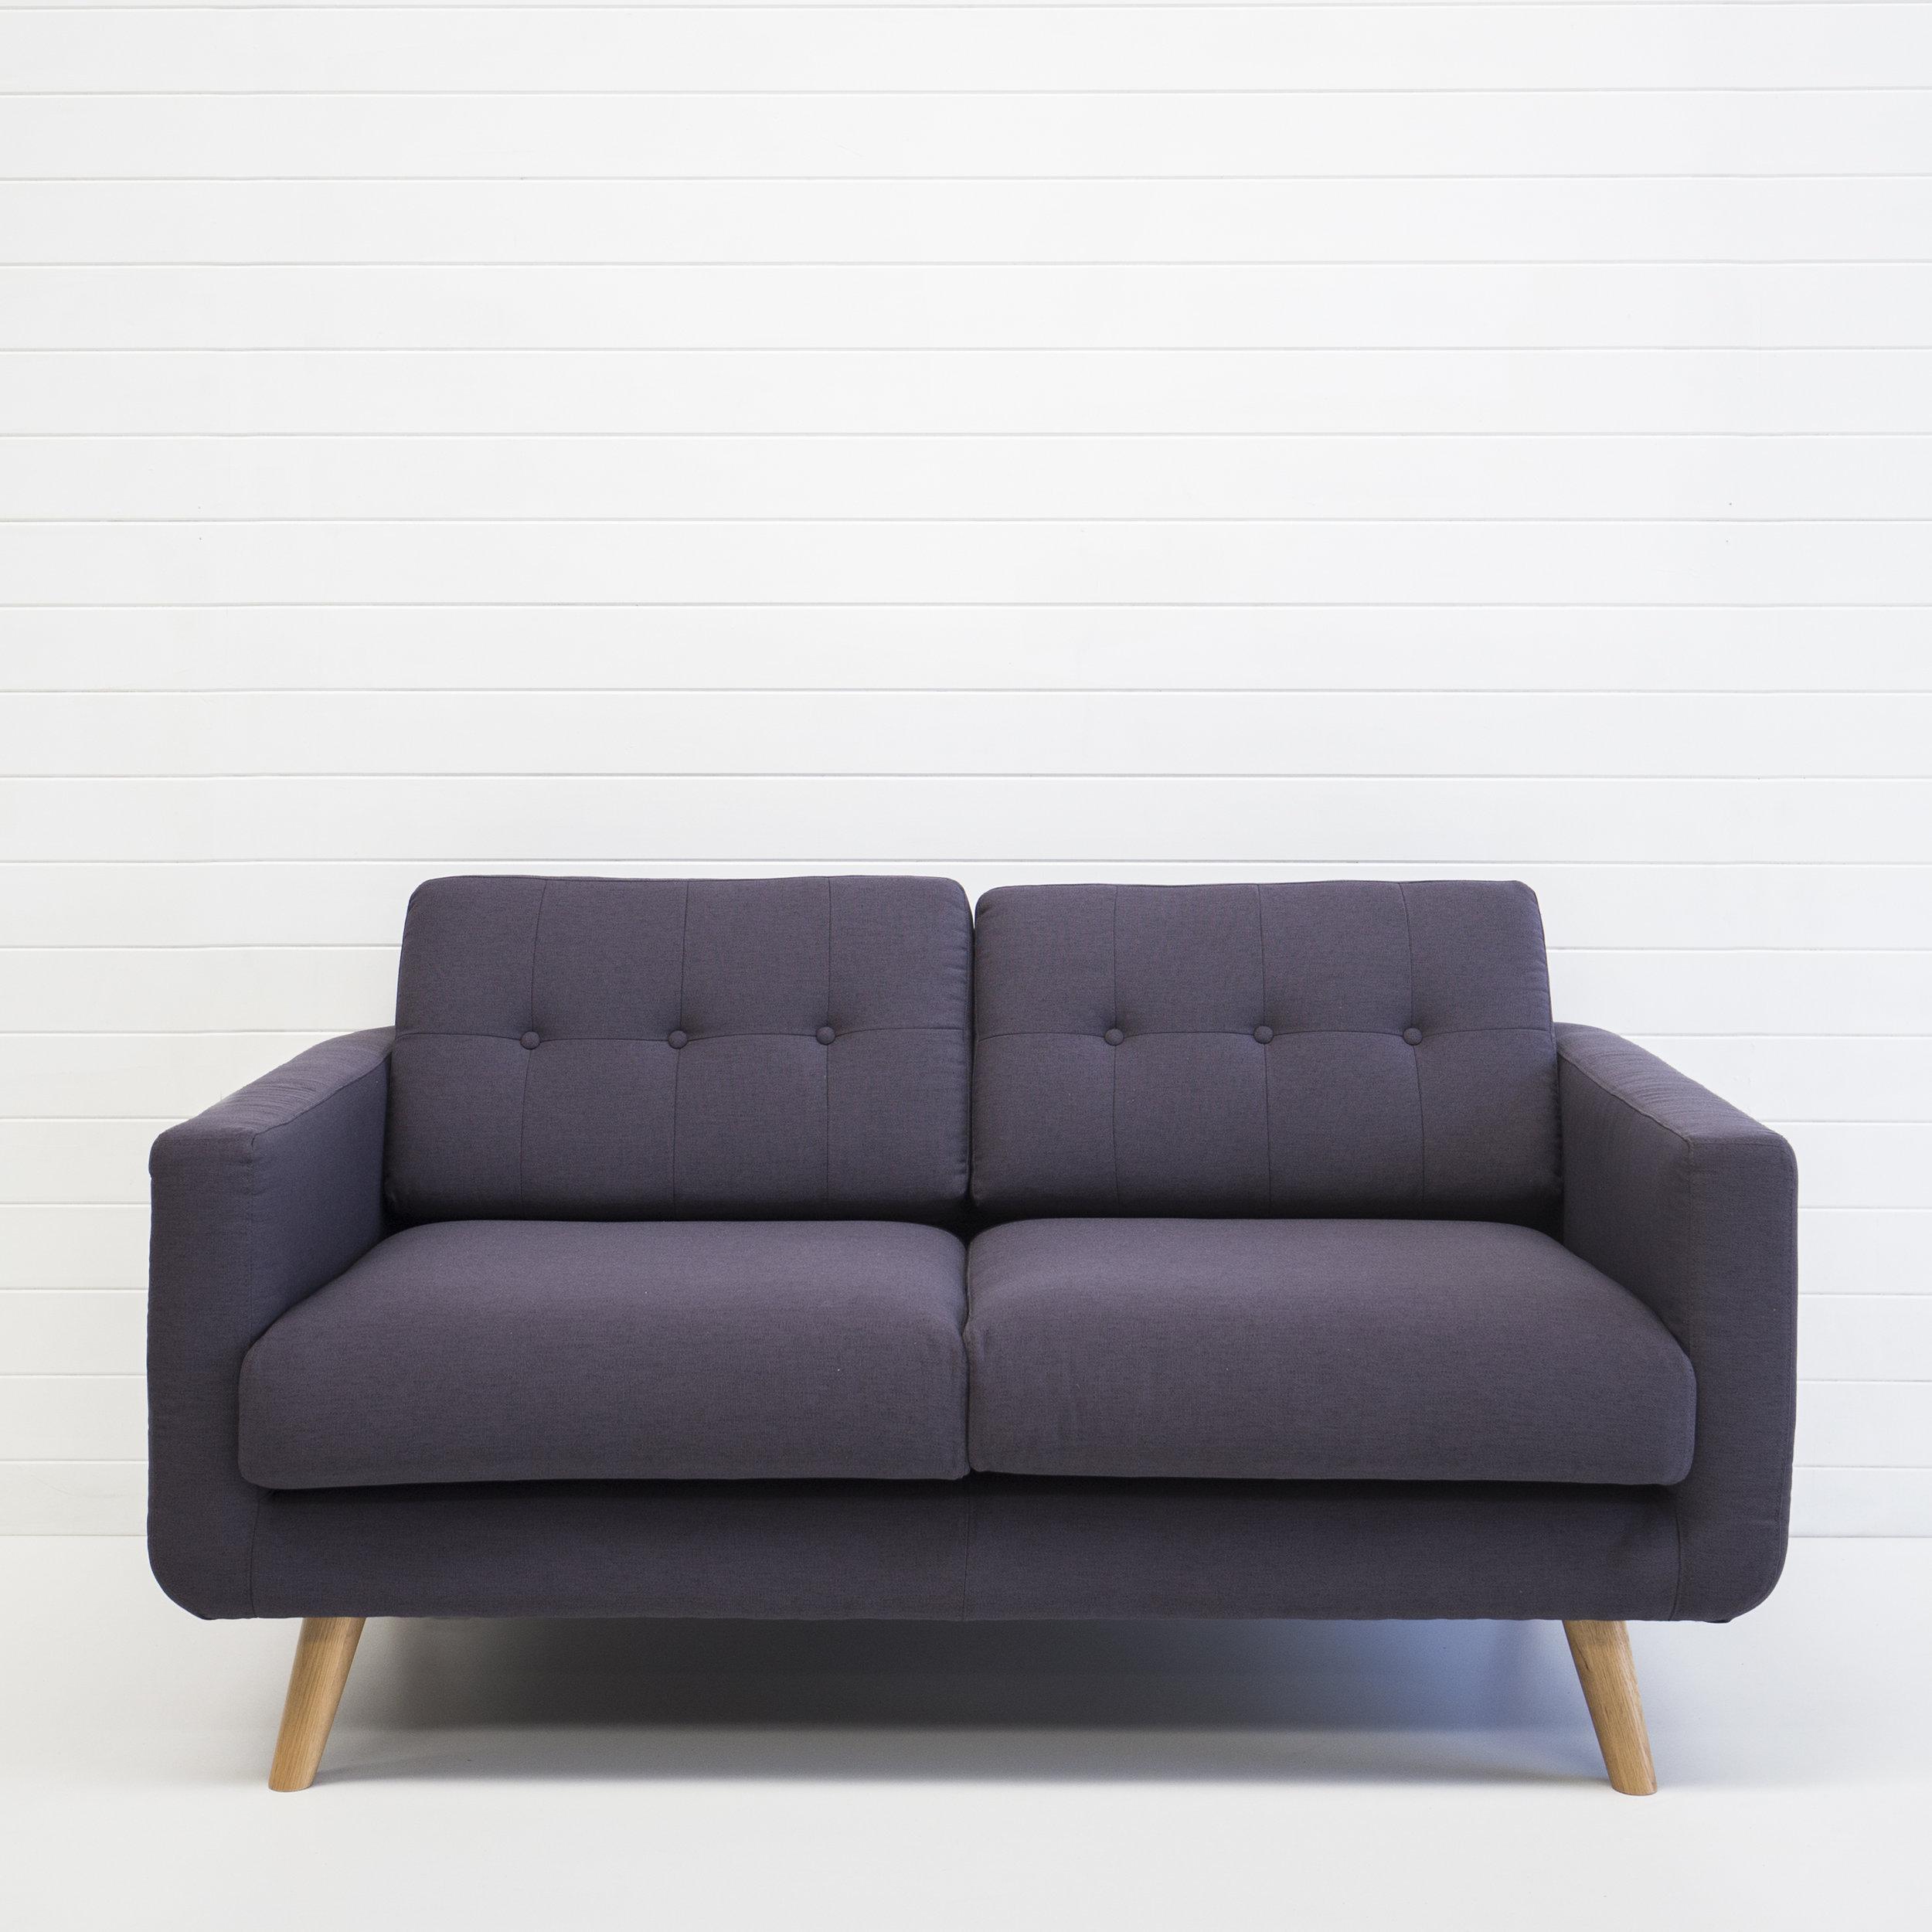 Two Seater Black Sofa